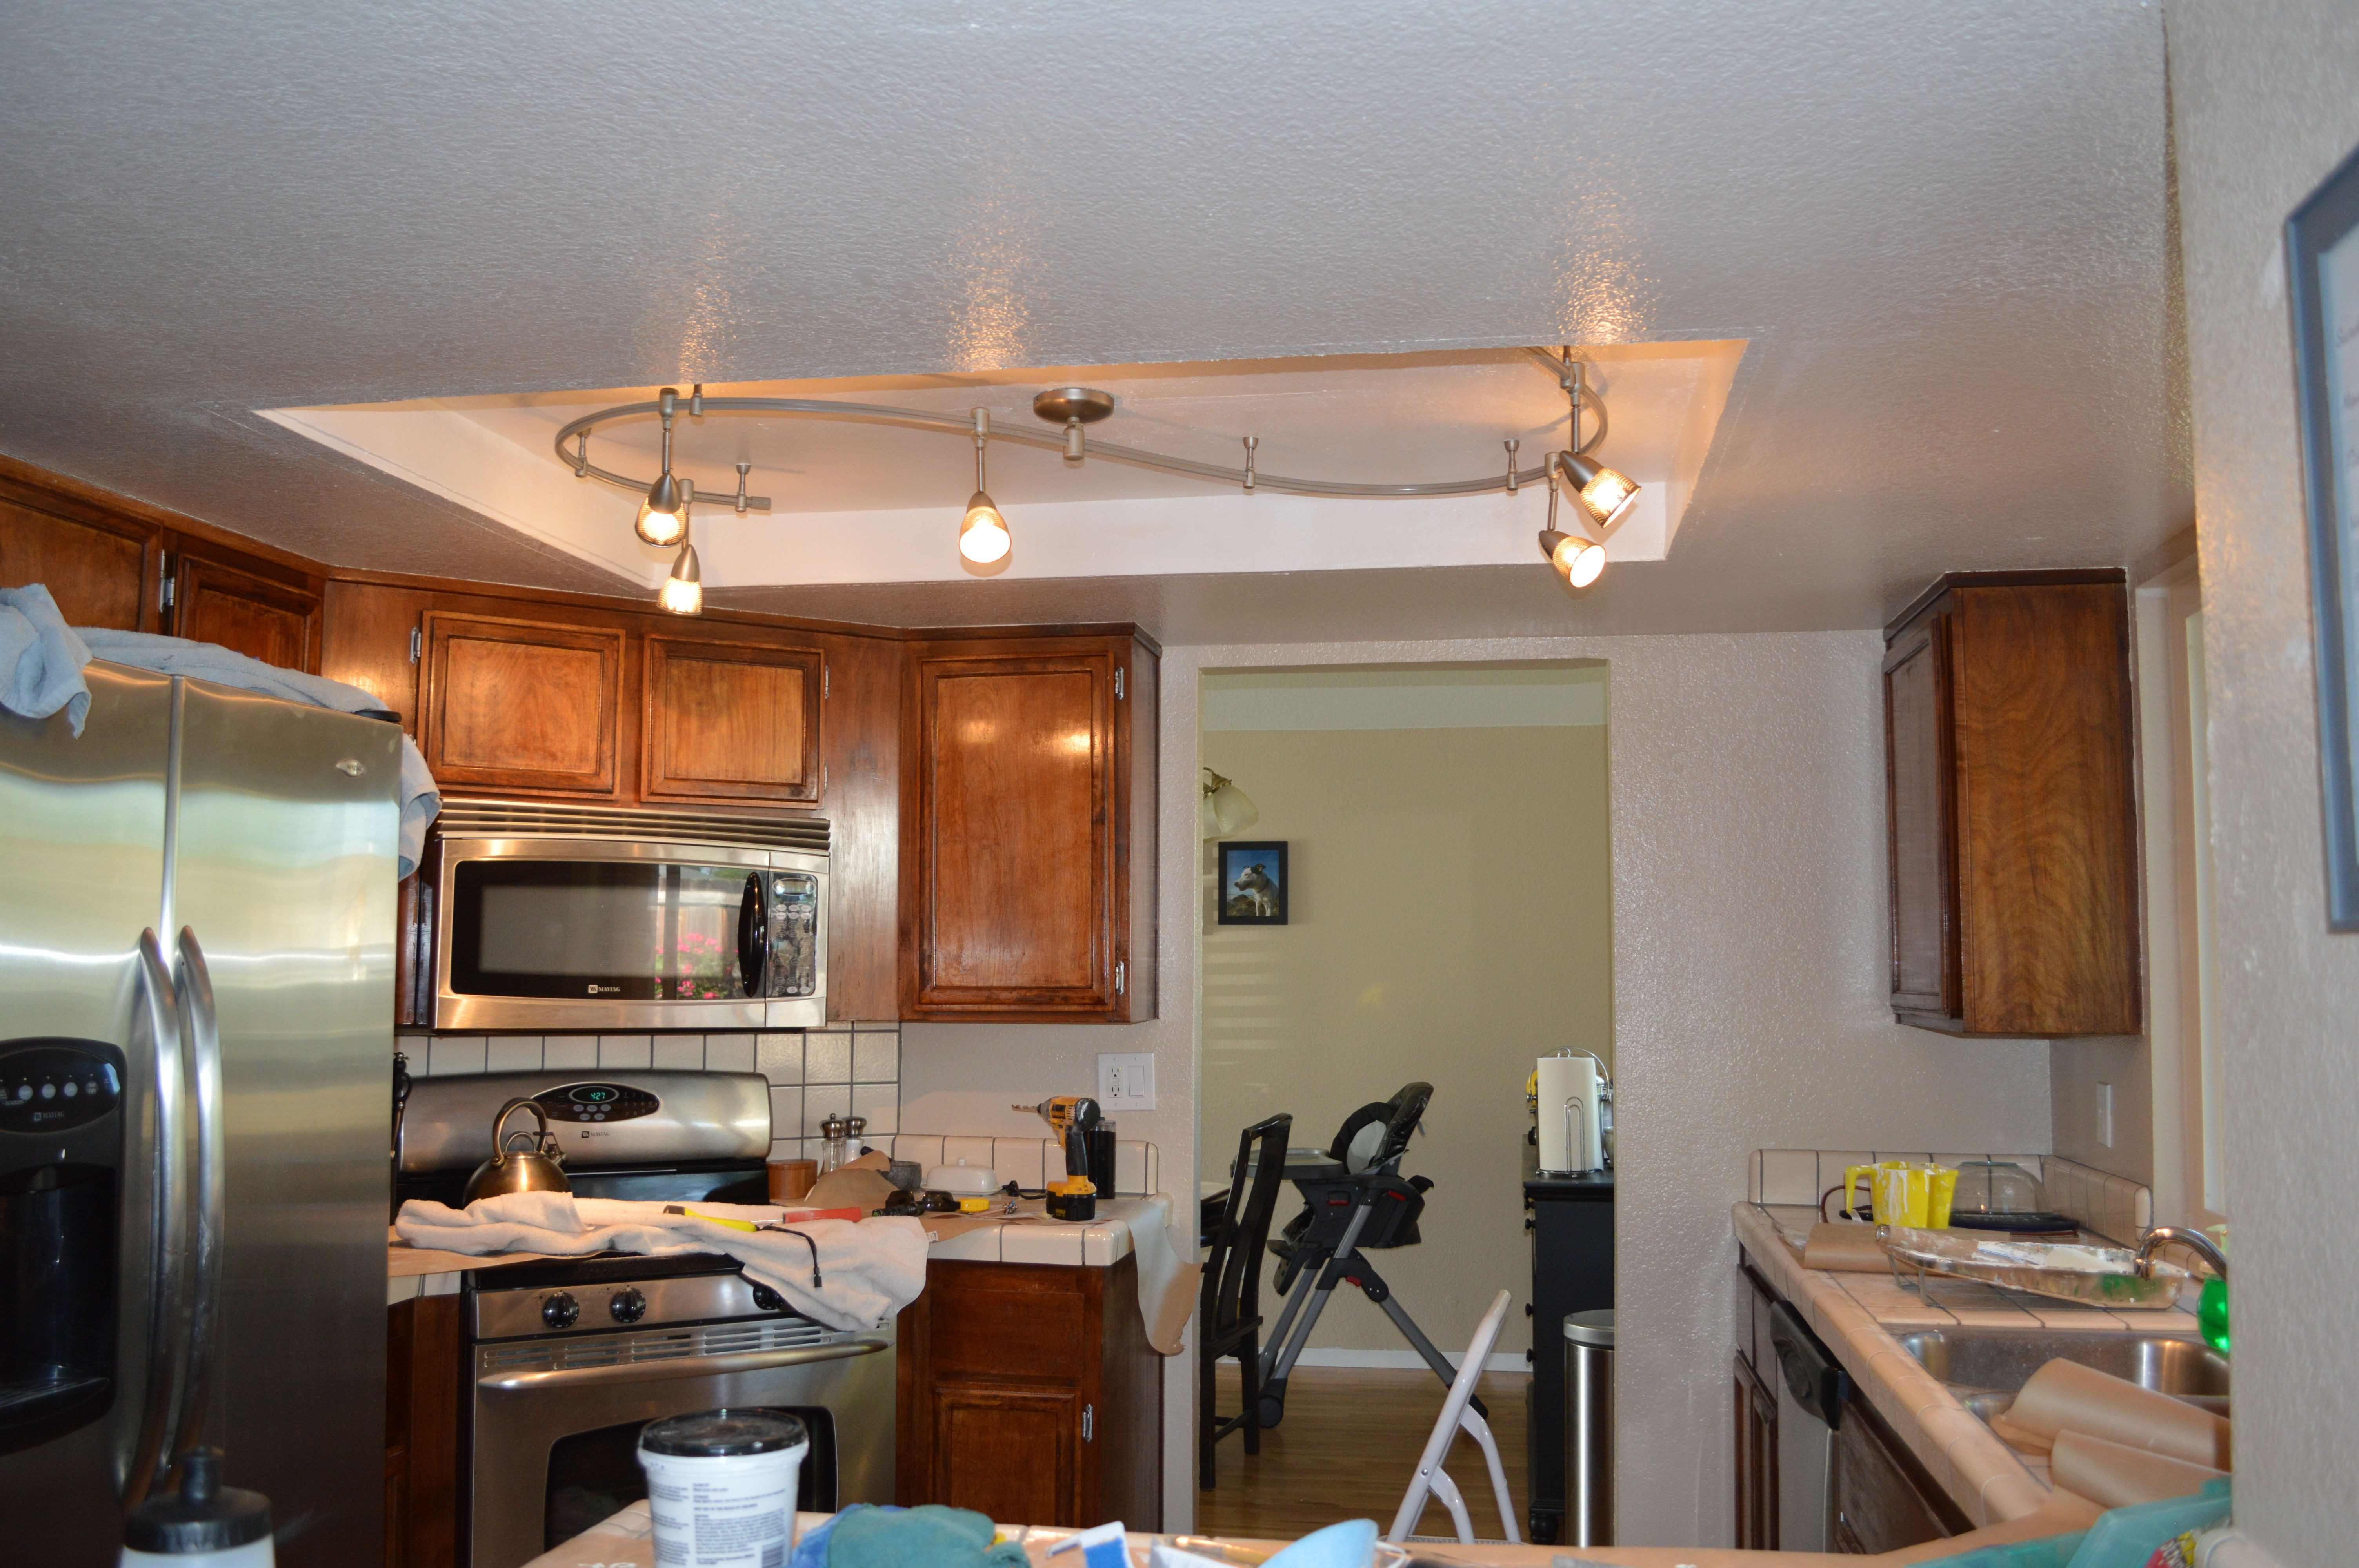 Fluorescent Kitchen Lighting Update Kitchen Lighting Kitchen Farmhouse Light Update I Think